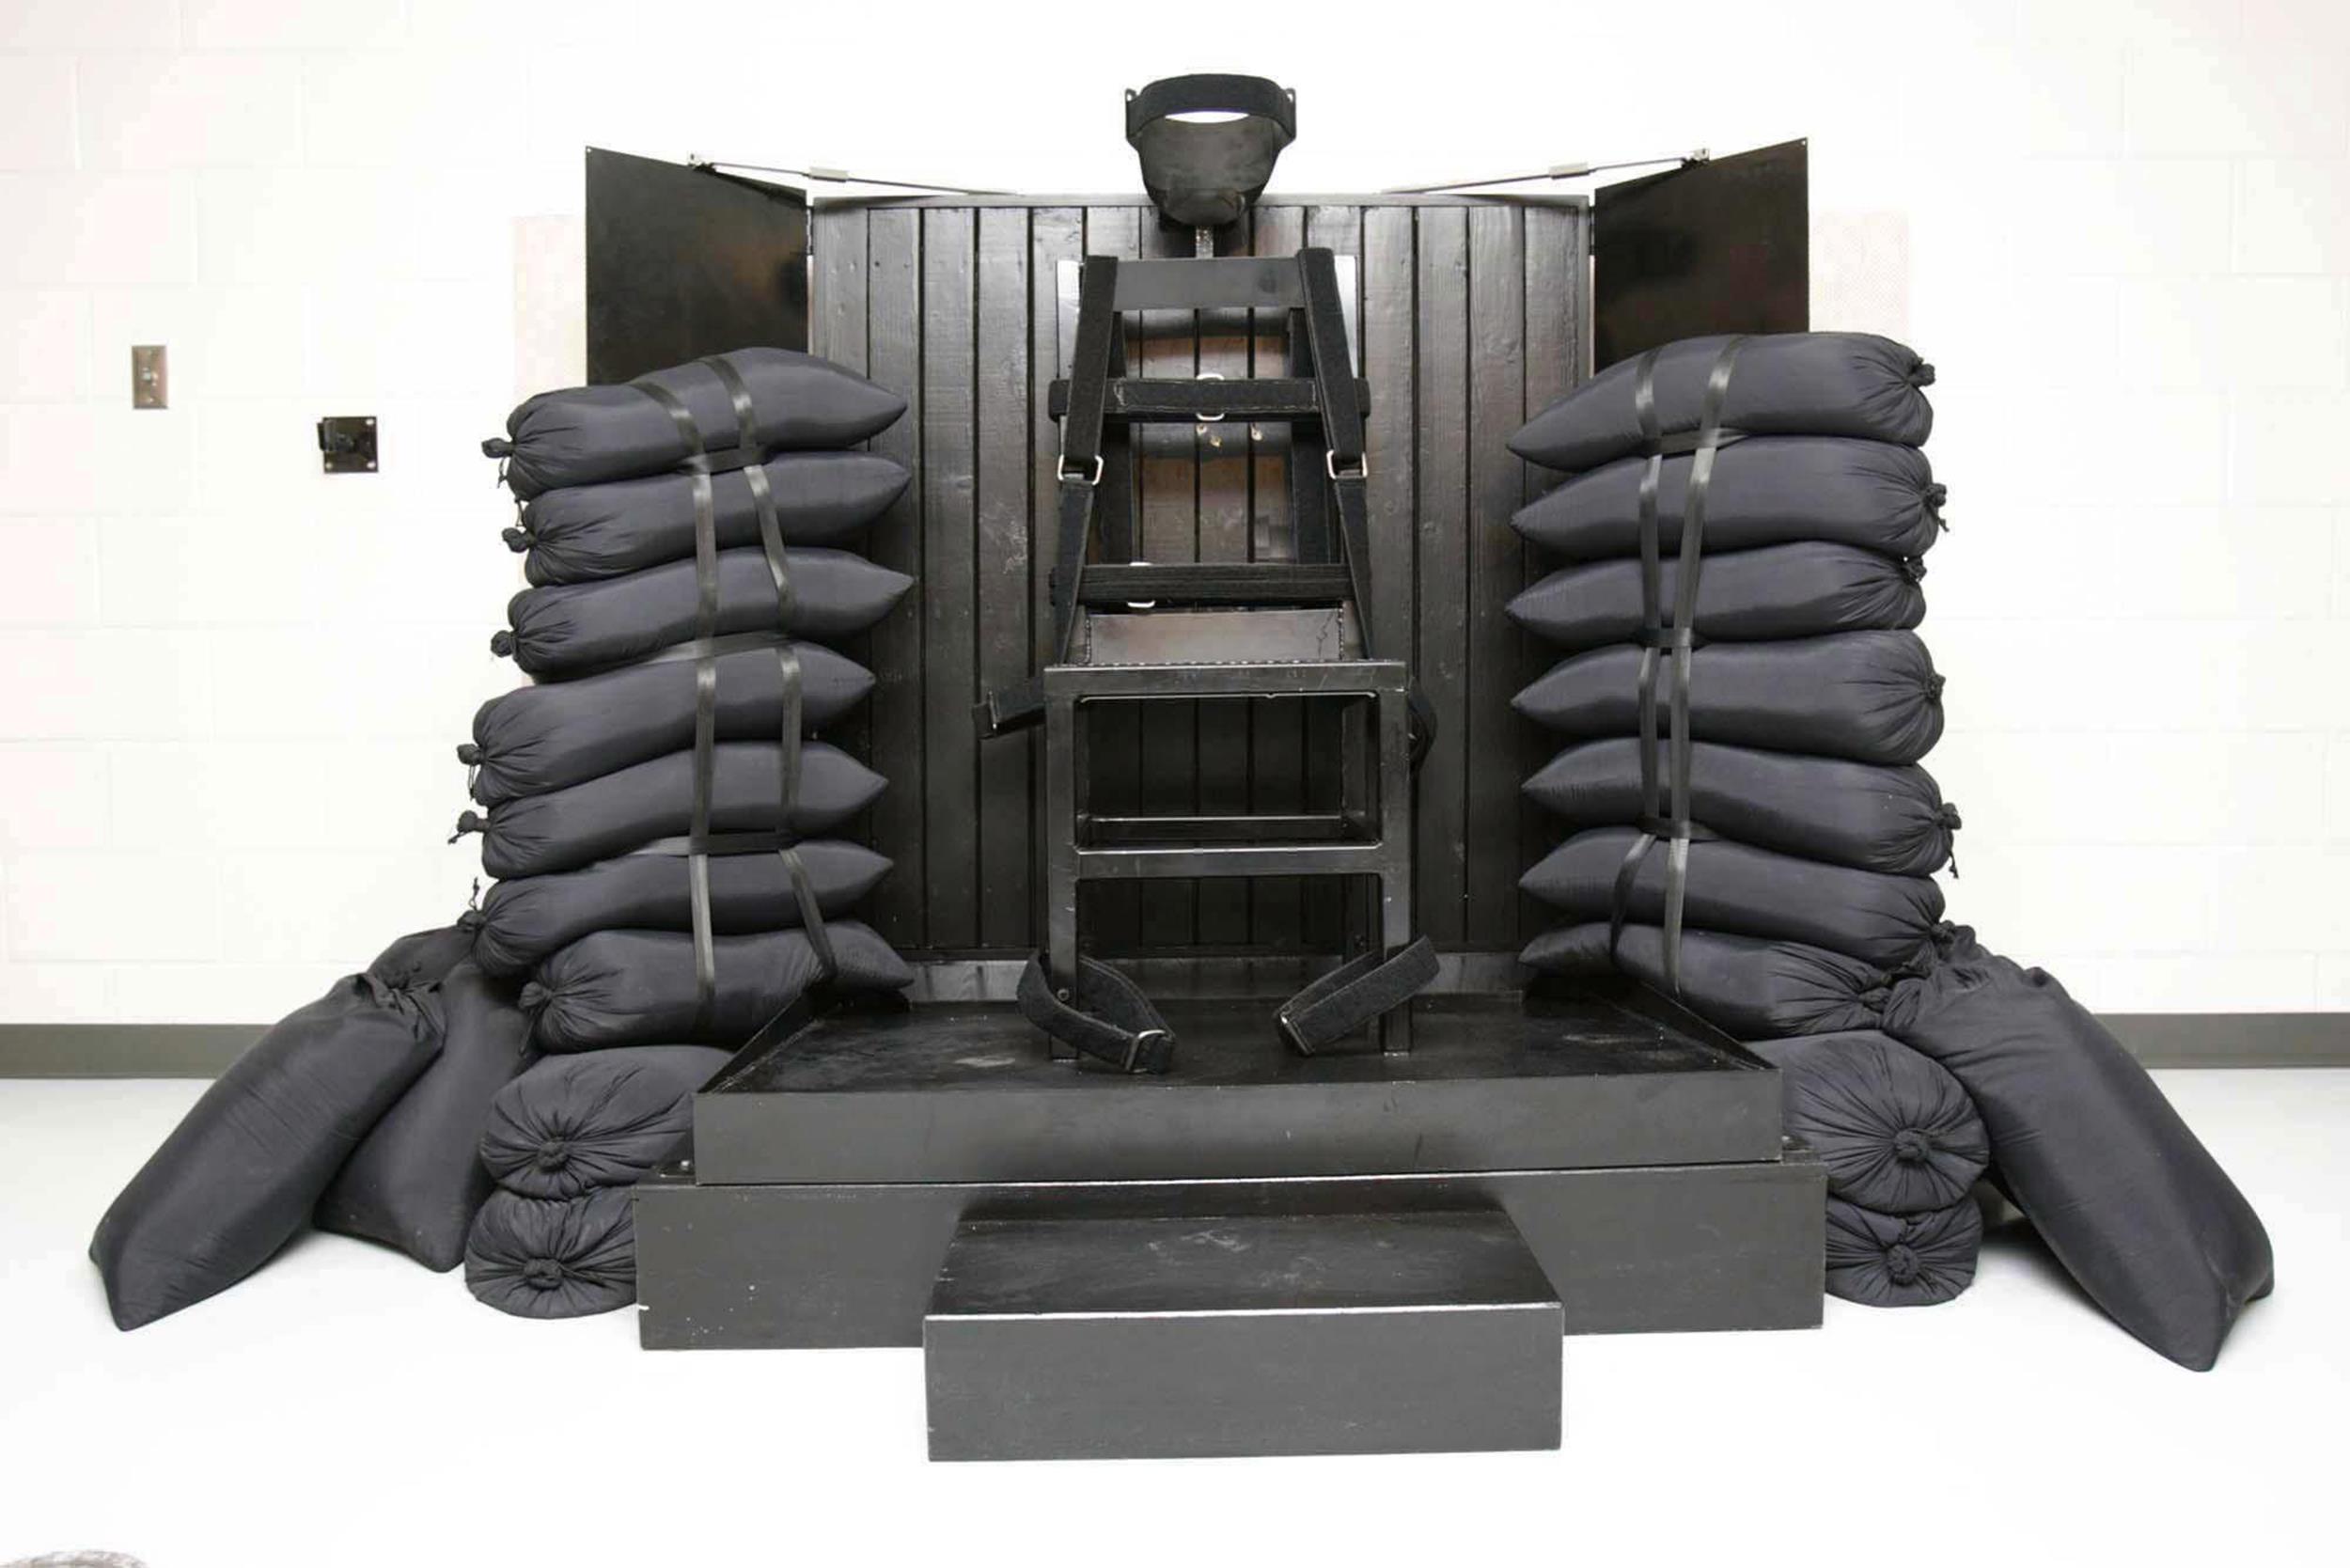 Electric chair chamber - Electric Chair Chamber 63